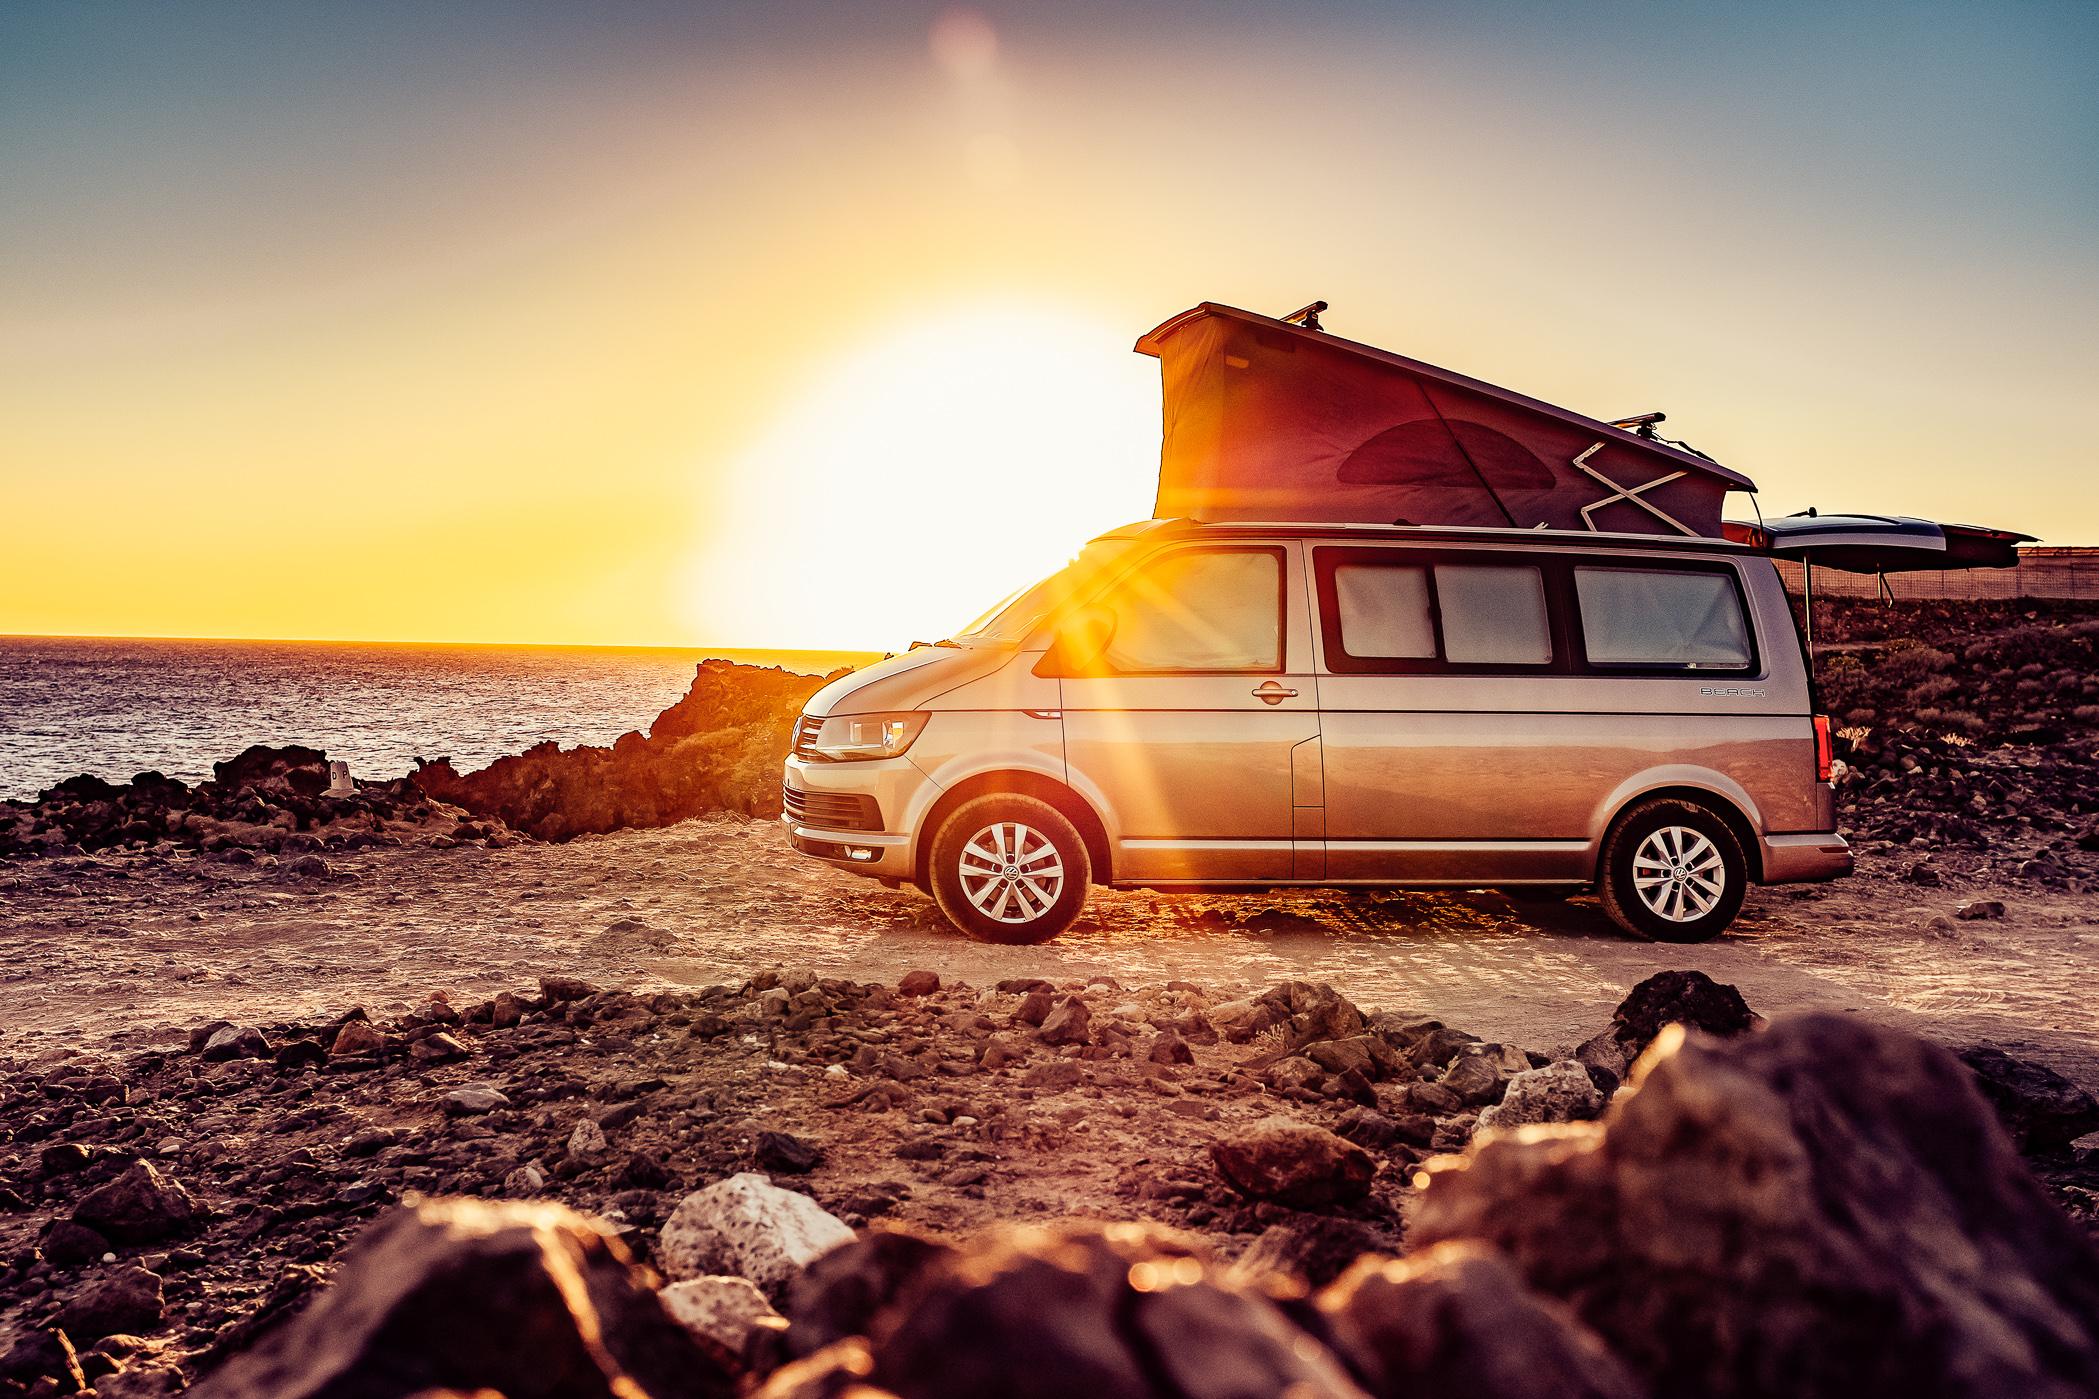 Bulli, Vintage van, Vanlife, VW Bus, Camping, Florian Kresse, Photography, Sundowner, Sonnenuntergang, Sonnenaufgang, Fotografie, Lifestyle